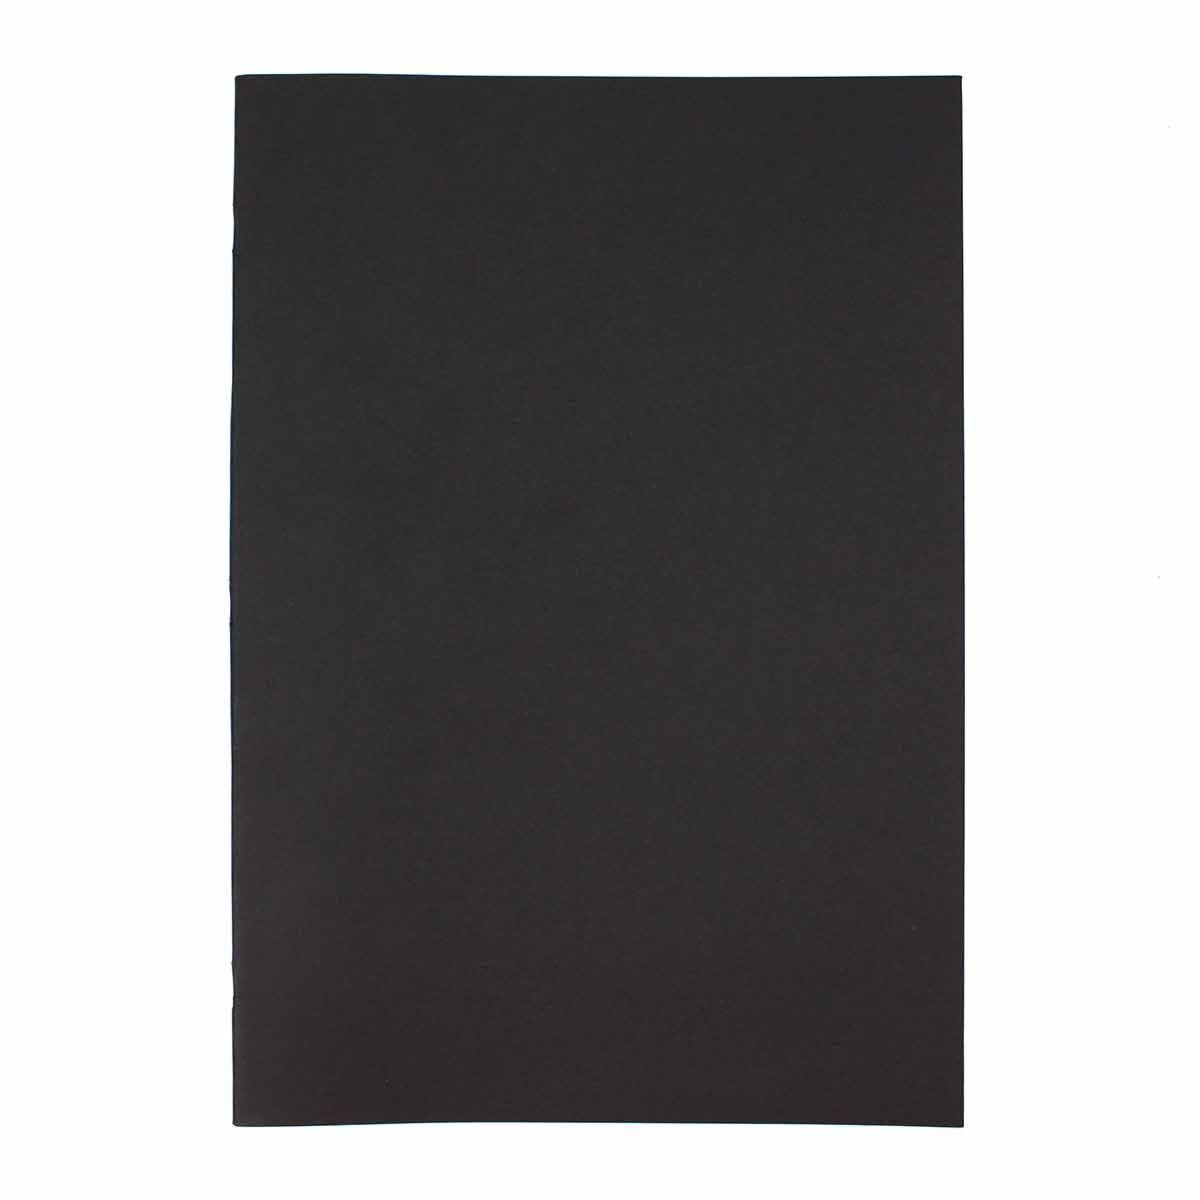 Starter Field A4 Sketchbook